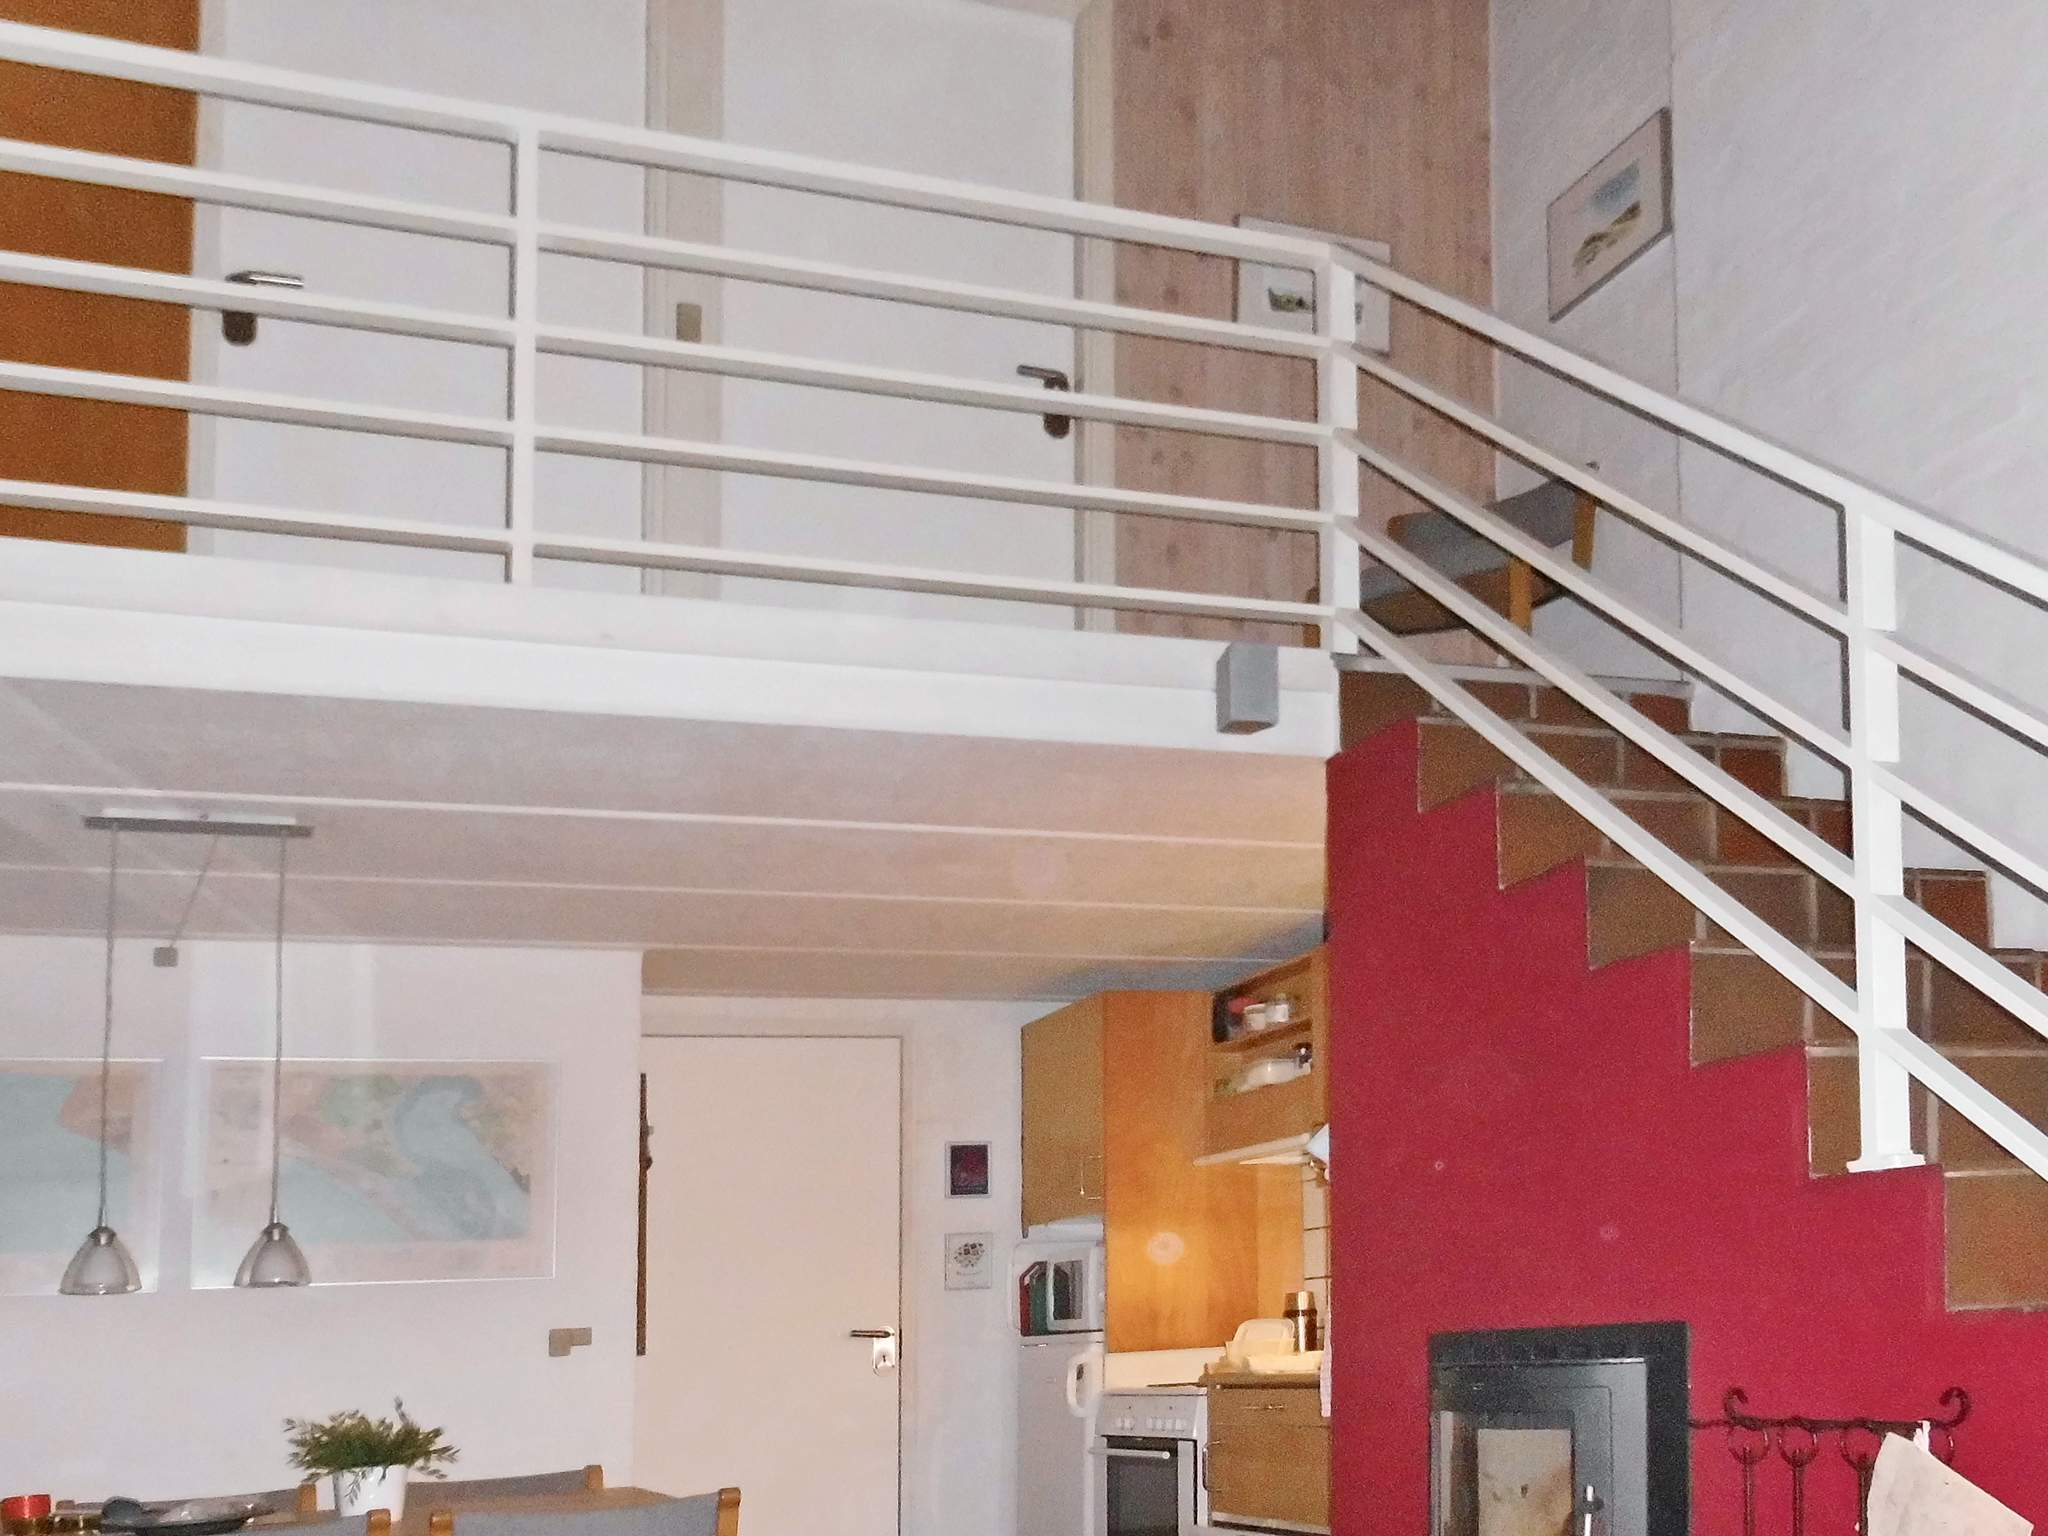 Ferienhaus Blåvand (88504), Blåvand, , Westjütland, Dänemark, Bild 6